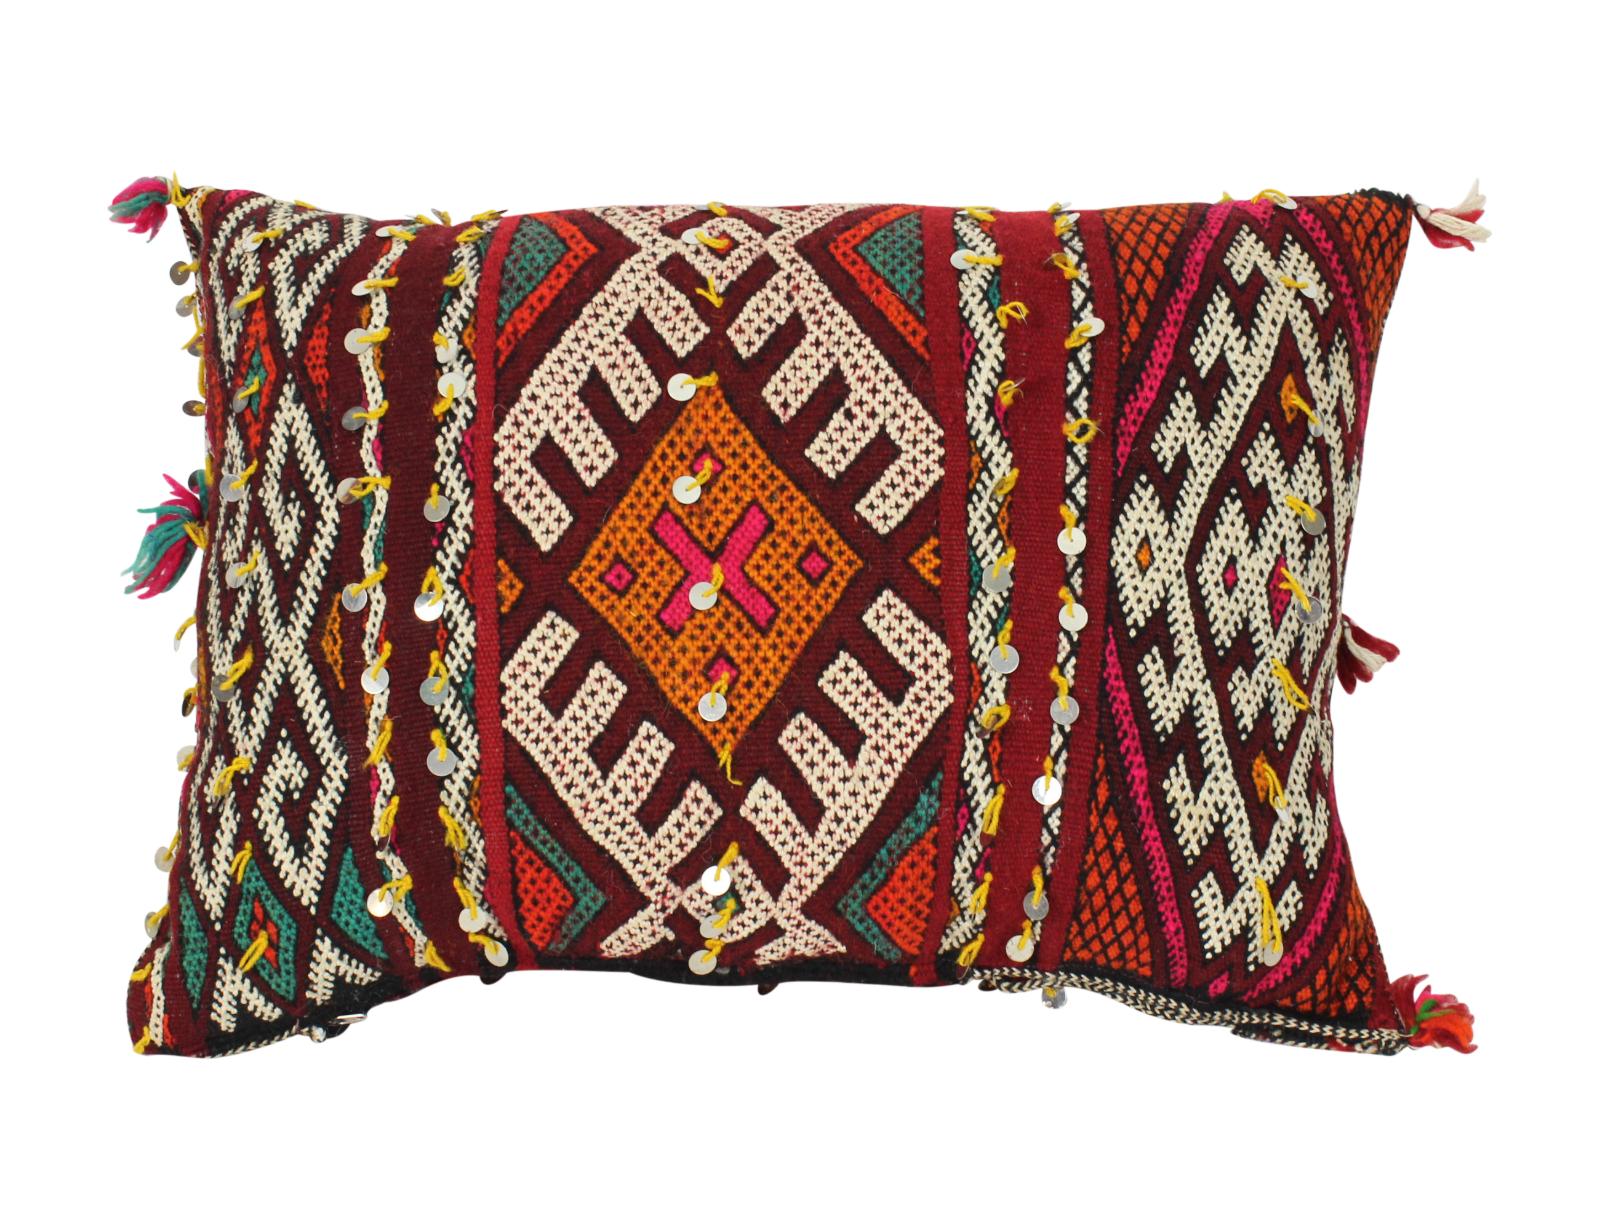 Tappeti Kilim Marocco : Tappeto kilim marocchino cuscino vintage marocchino kilim imbottiti